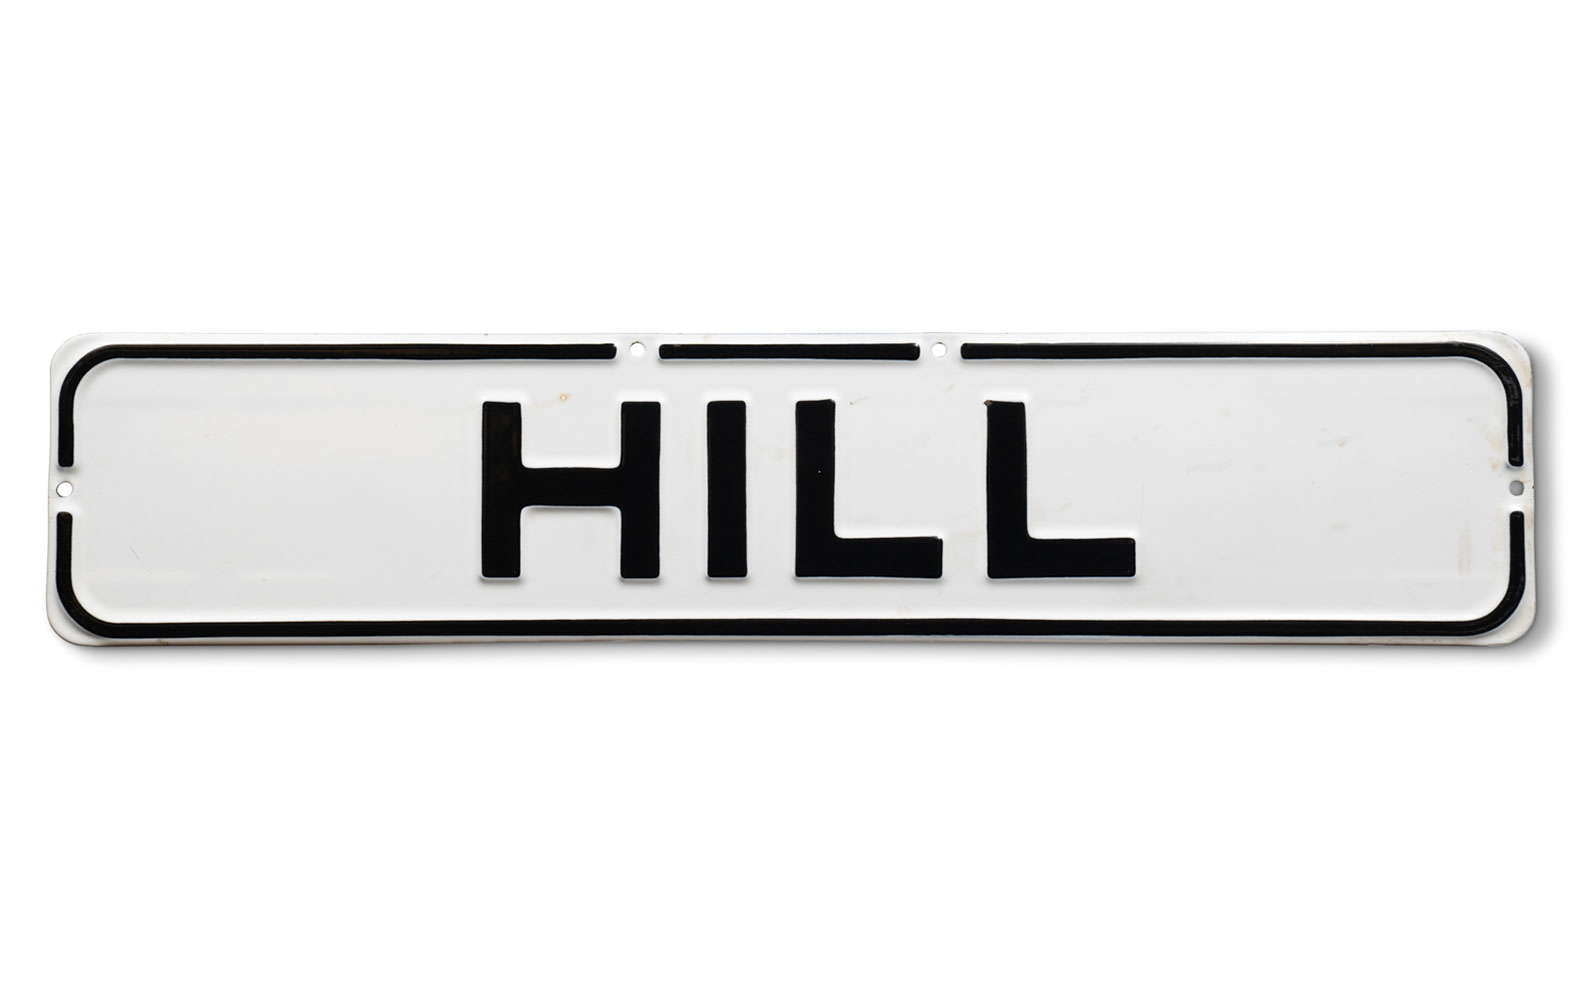 San Francisco Hill Street Sign